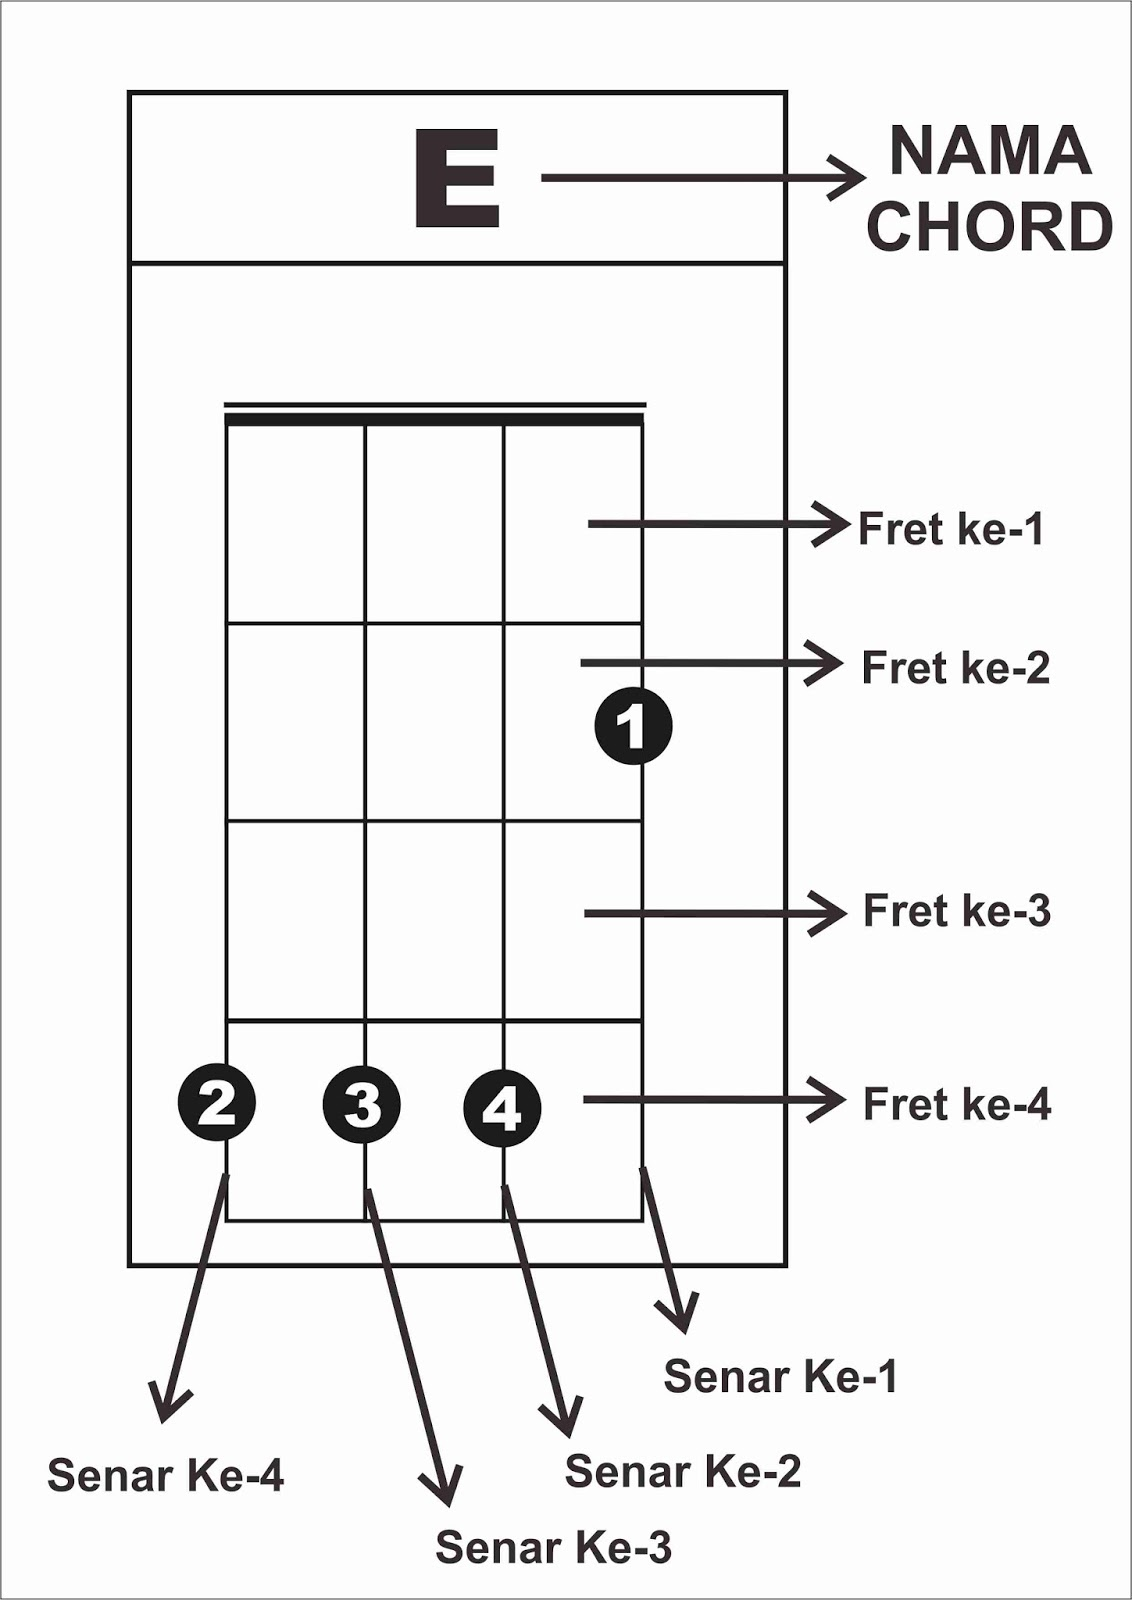 Stem Kentrung Senar 3 : kentrung, senar, Belajar, Kentrung, Senar, Mudah